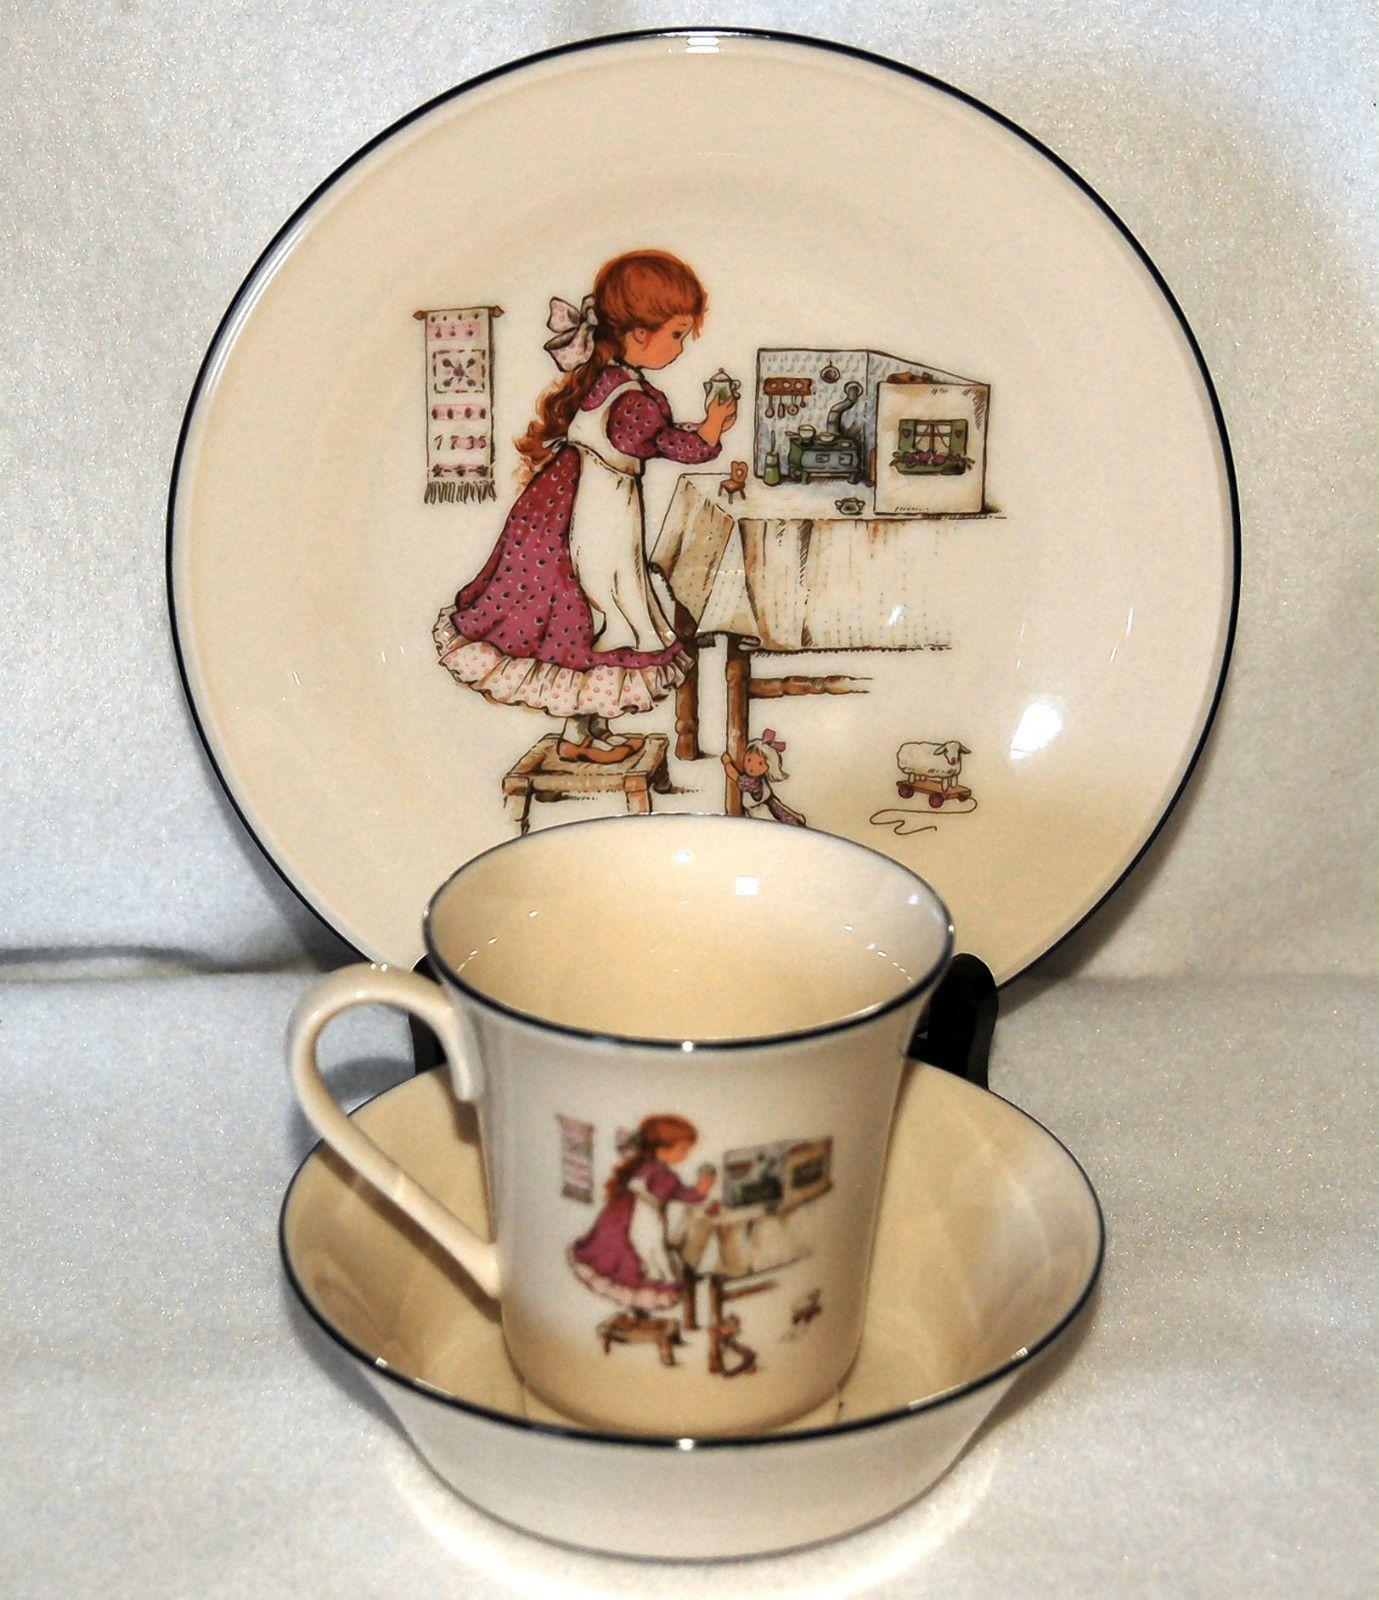 Lenox Special Kids Dinnerware Childrens Dishes Mugs Set